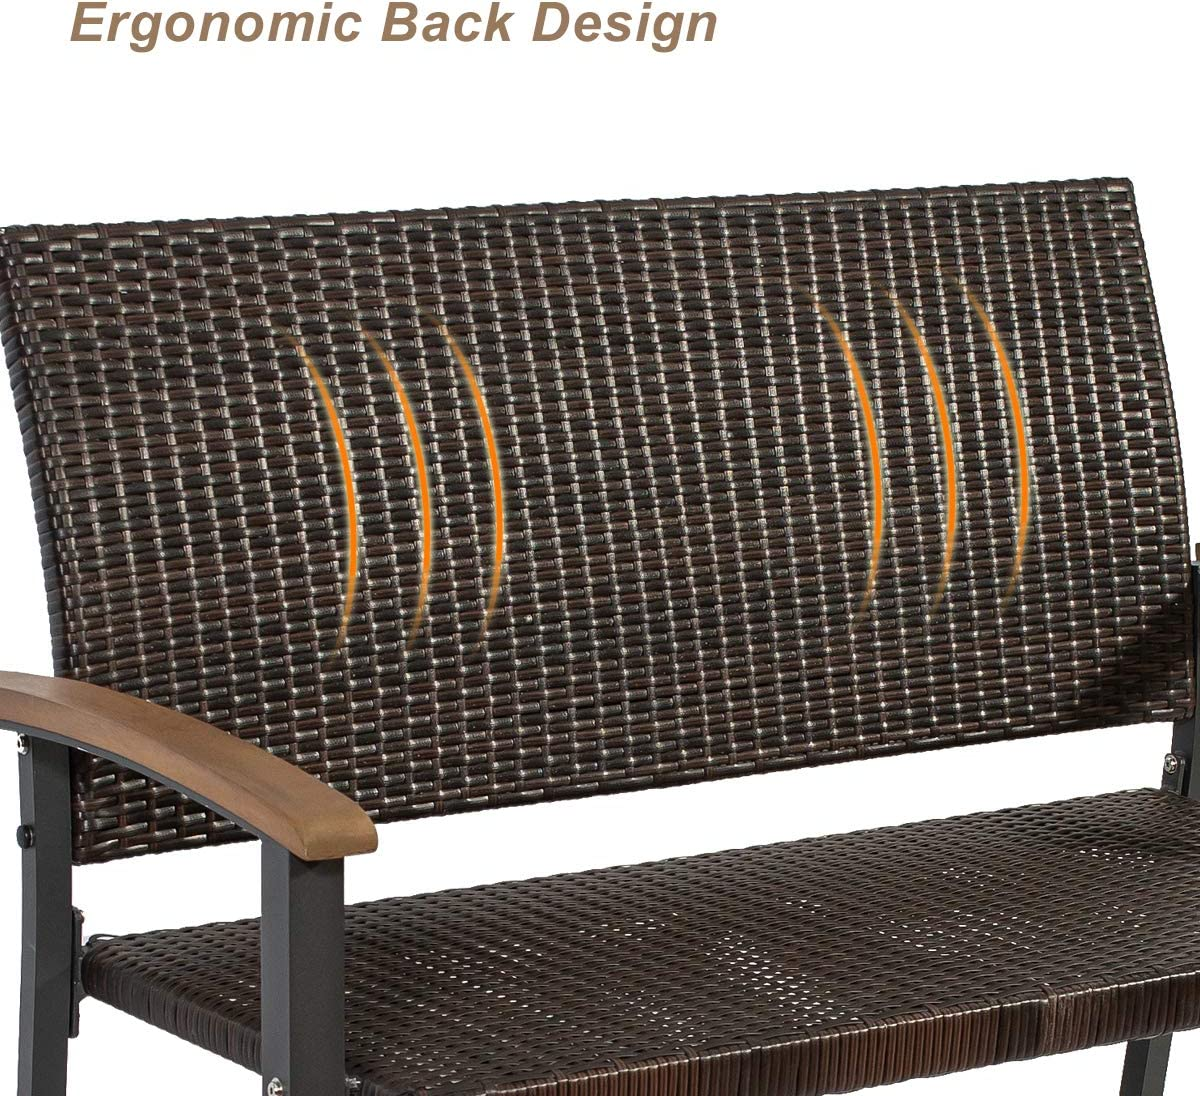 Front Porch,Backyard Park Outdoor Garden Bench Brown Metal Frame Wicker Rattan Furniture Bench for Patio